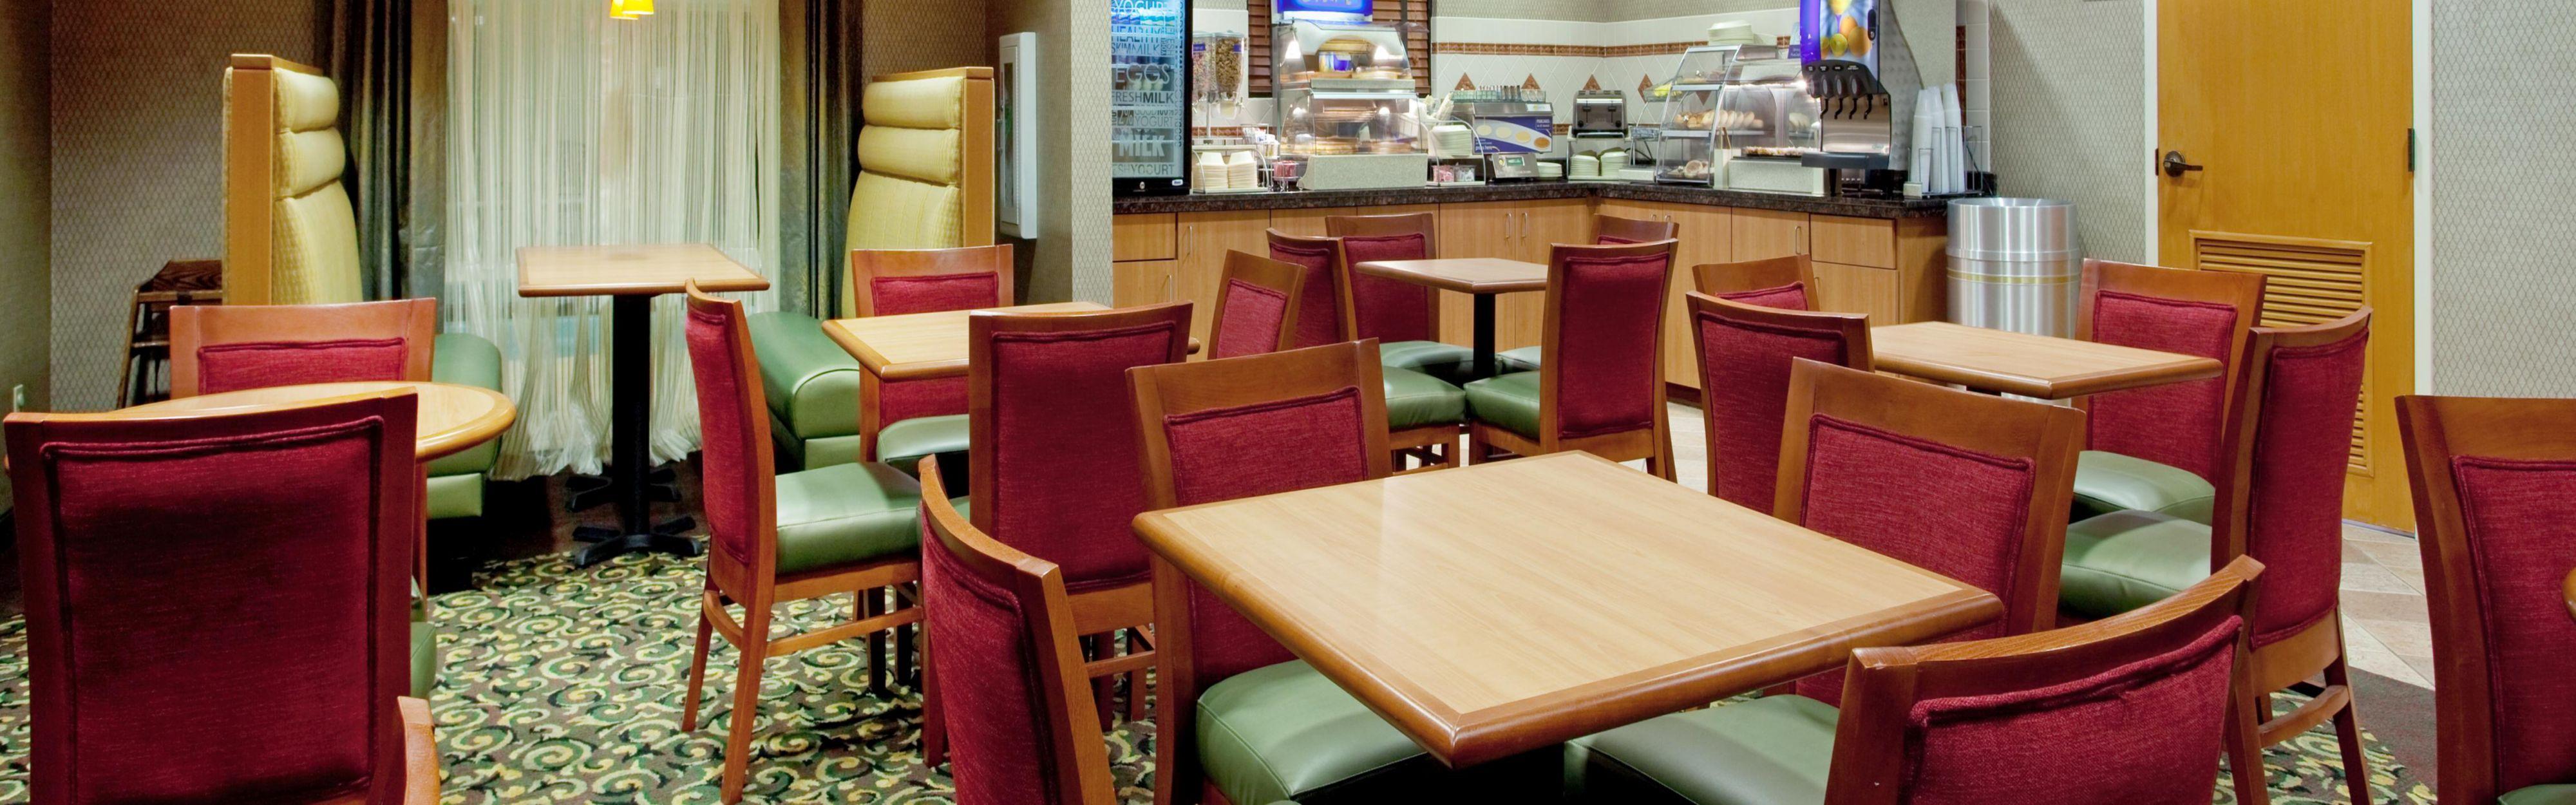 Holiday Inn Express Suites Sulphur Lake Charles Hotel Sulphur La 70665